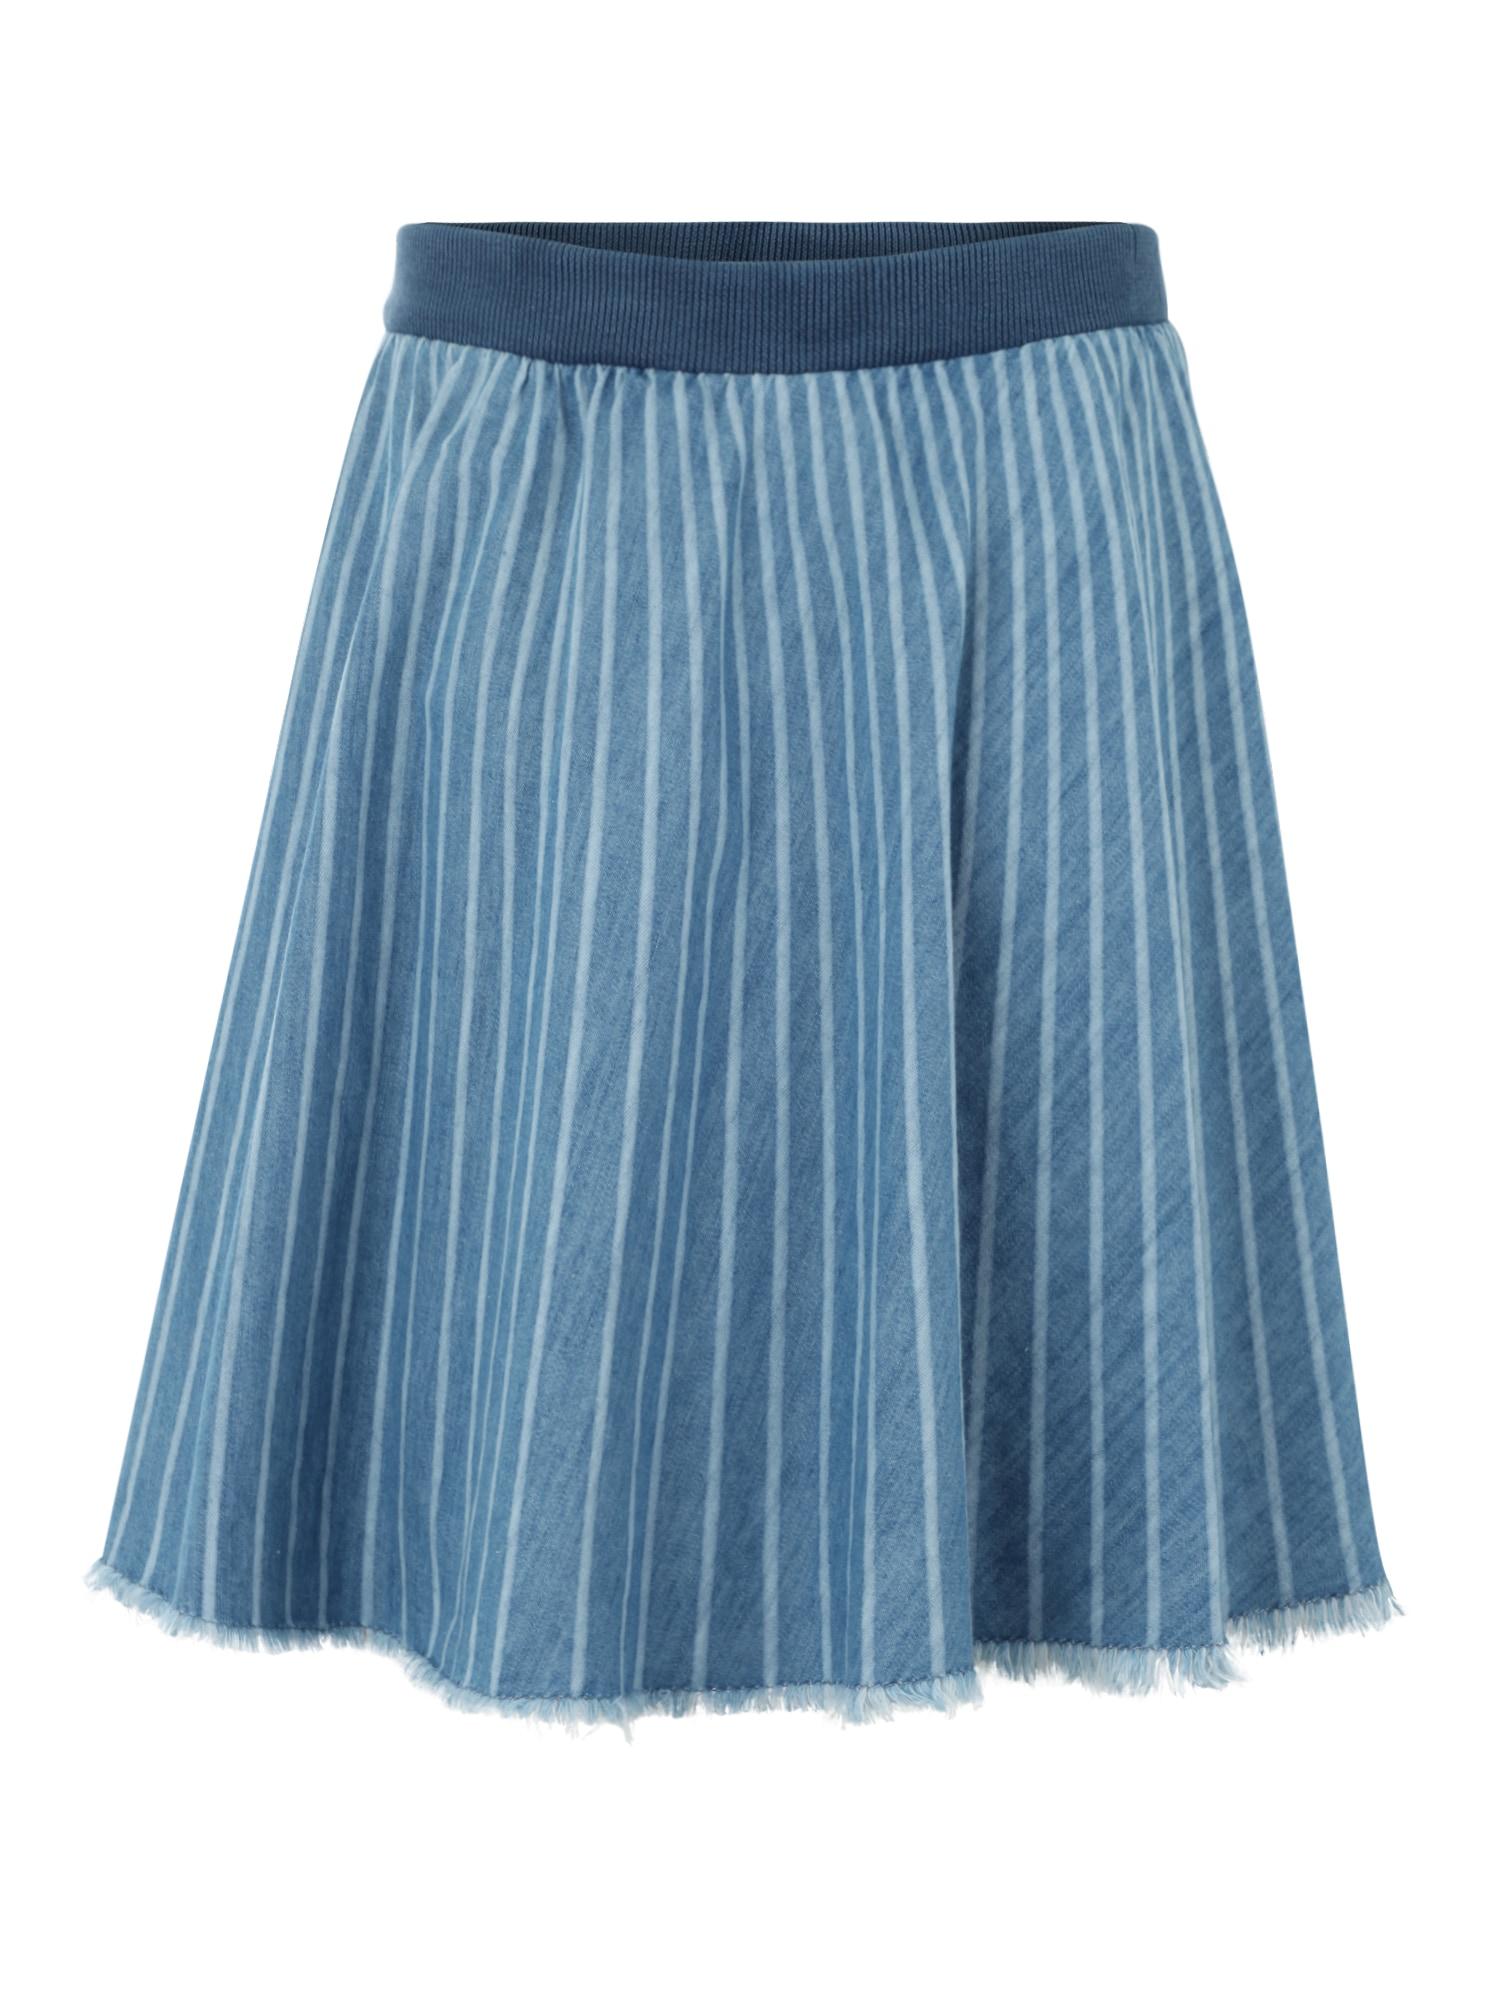 Pepe Jeans, Meisjes Rok 'JENNA', blauw denim